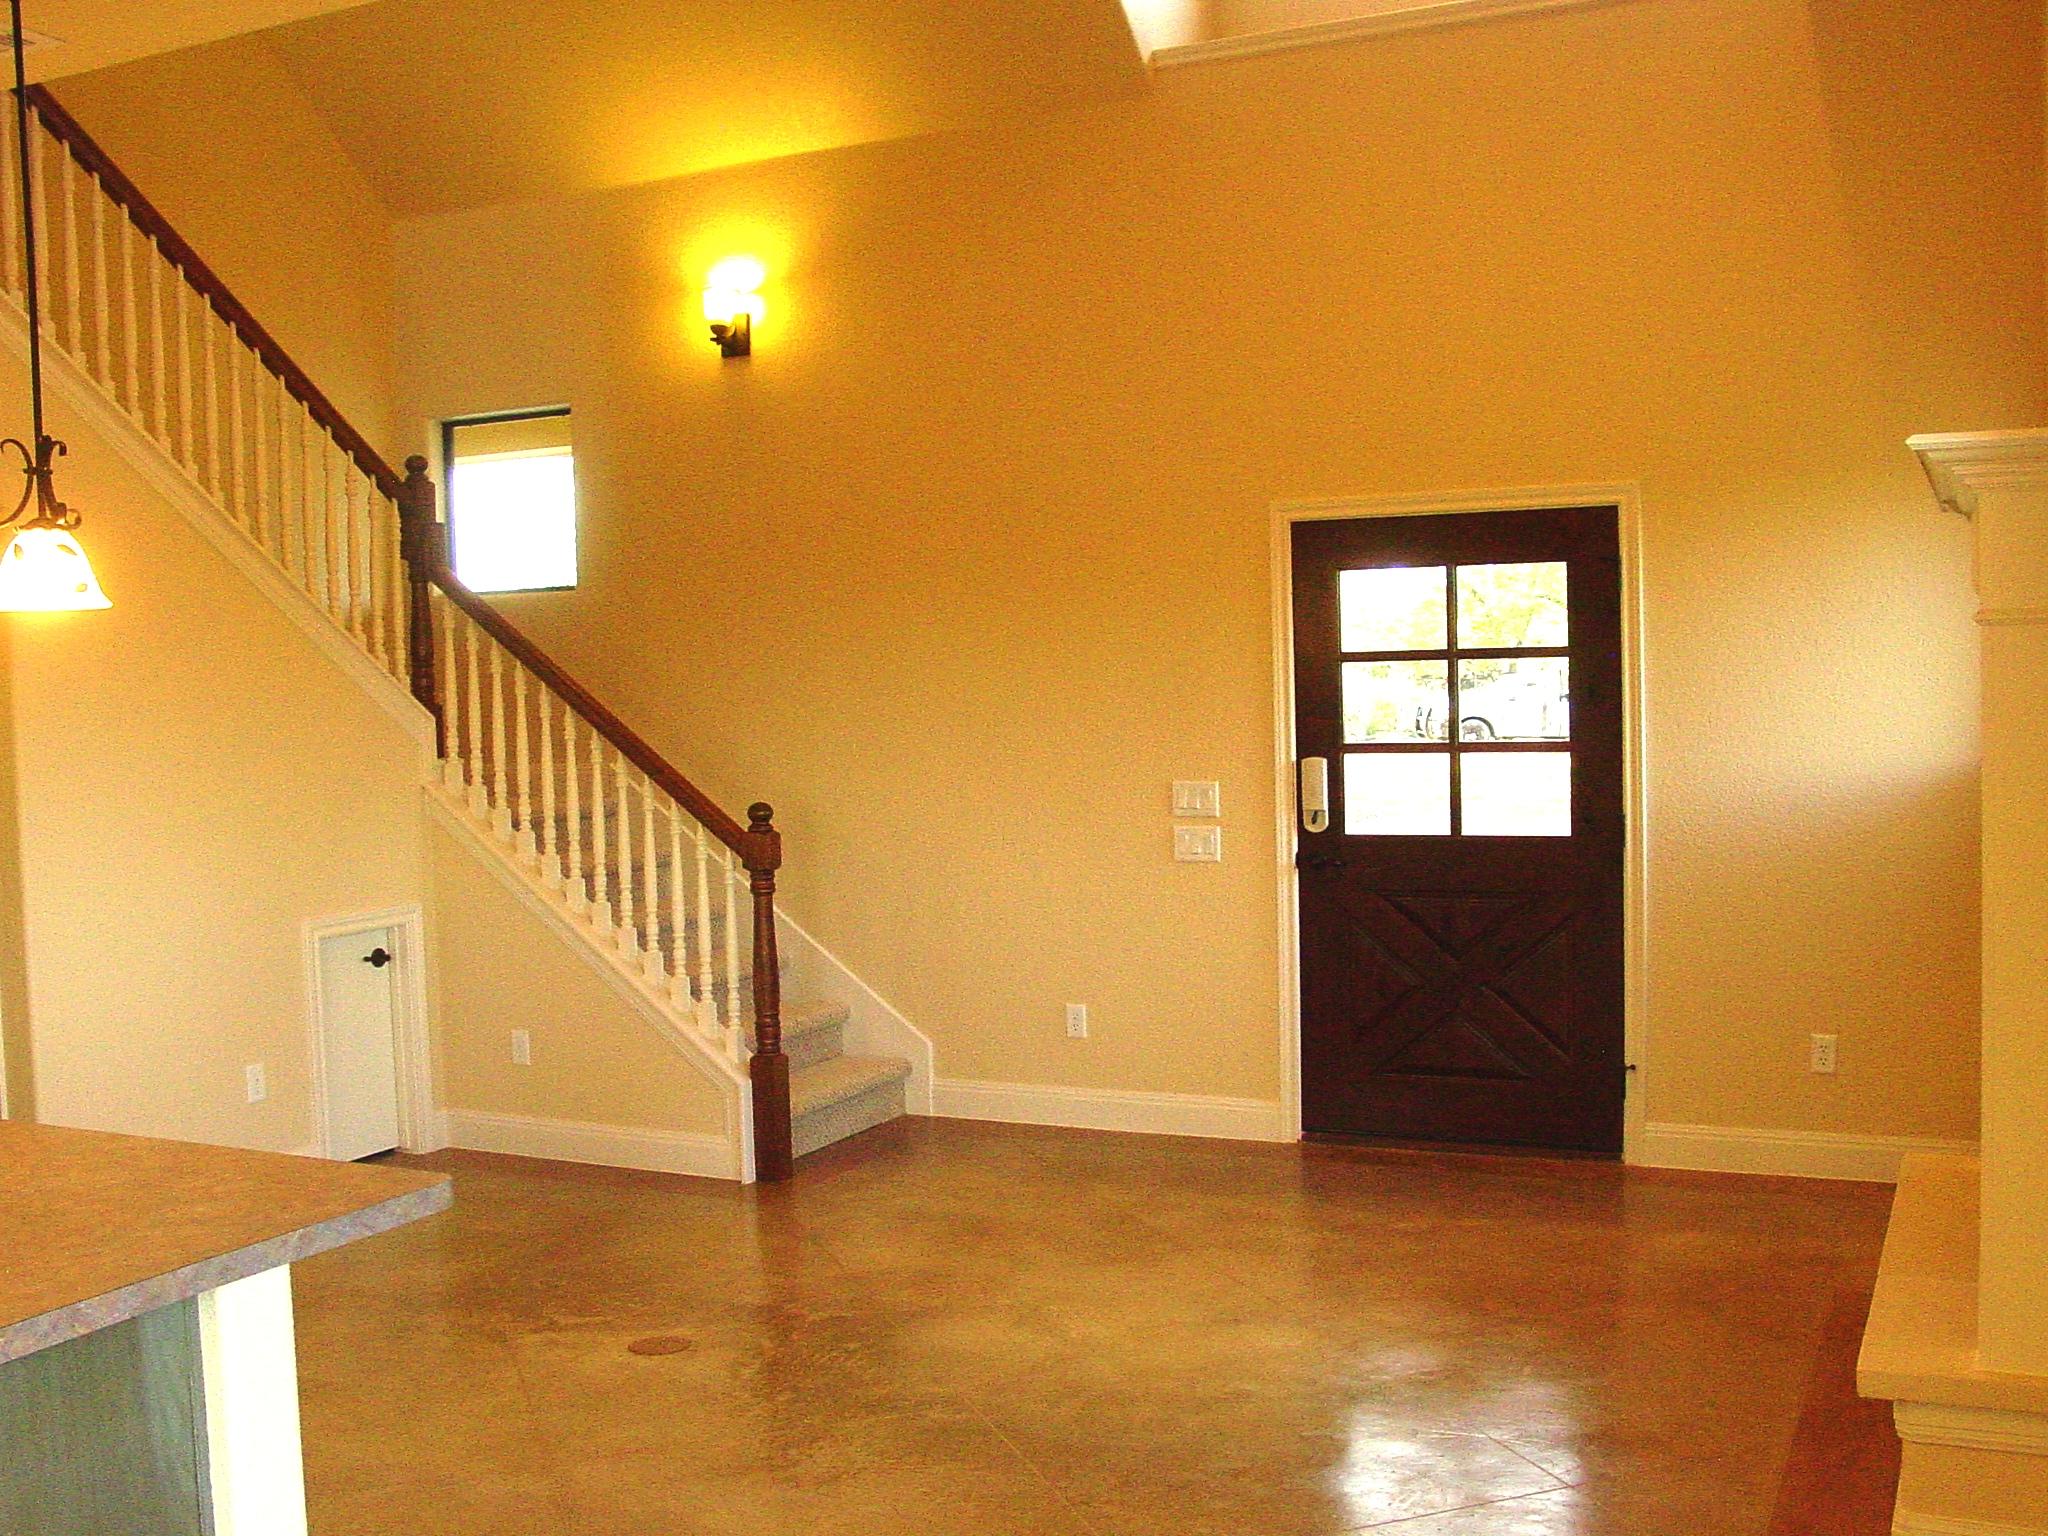 411 HH - Complete, Interior, Living Room.JPG